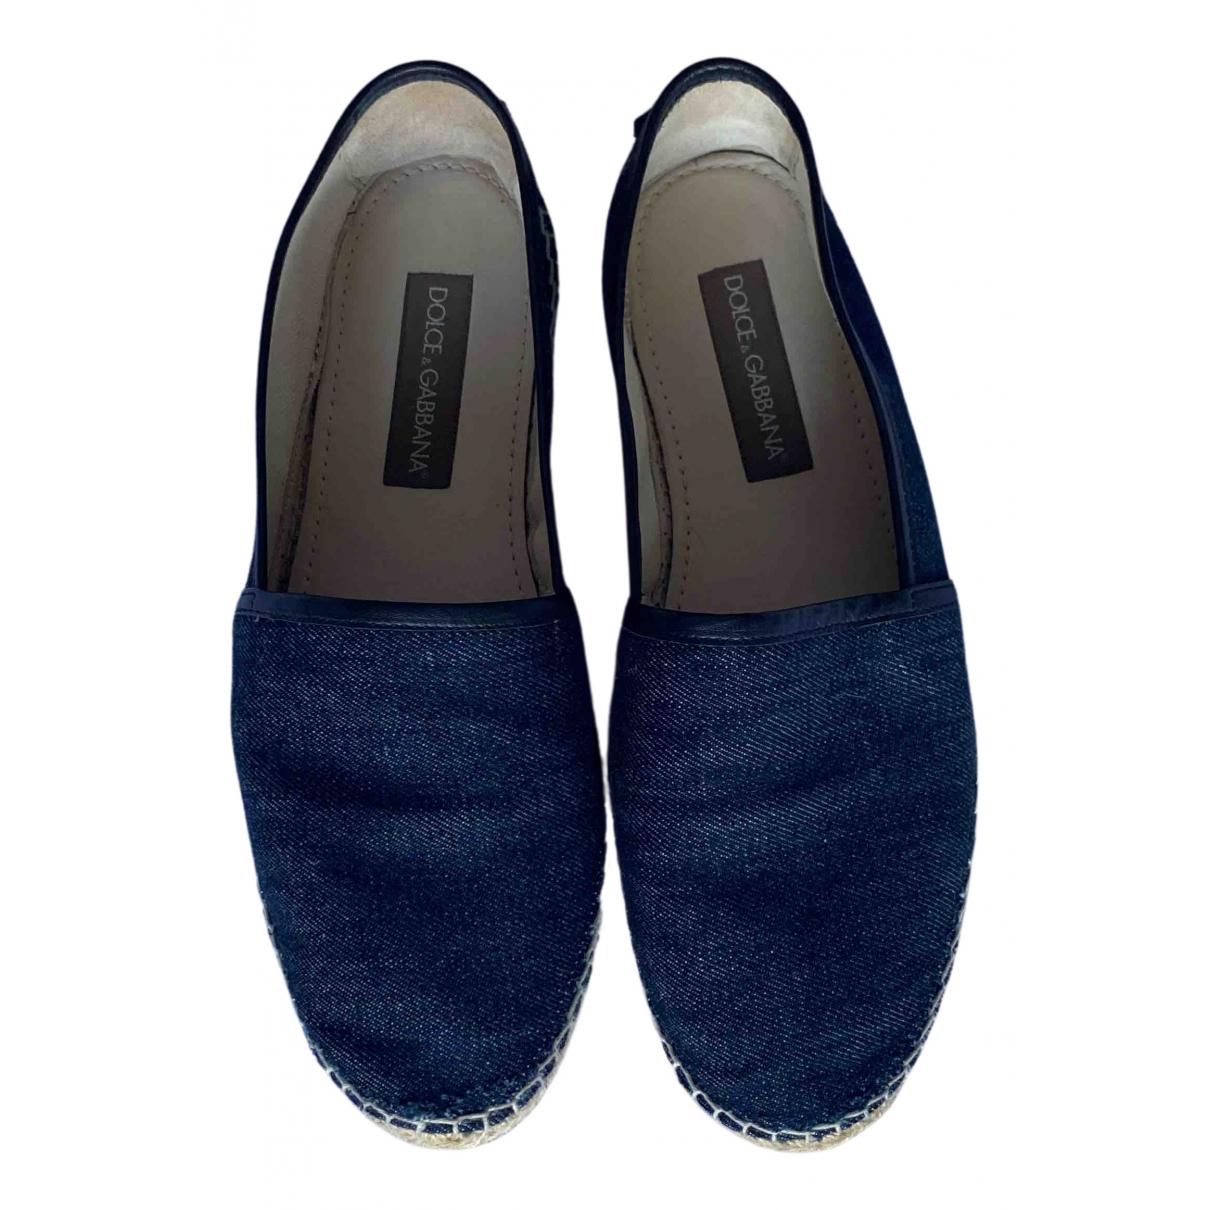 Dolce & Gabbana \N Espadrilles in  Blau Leinen